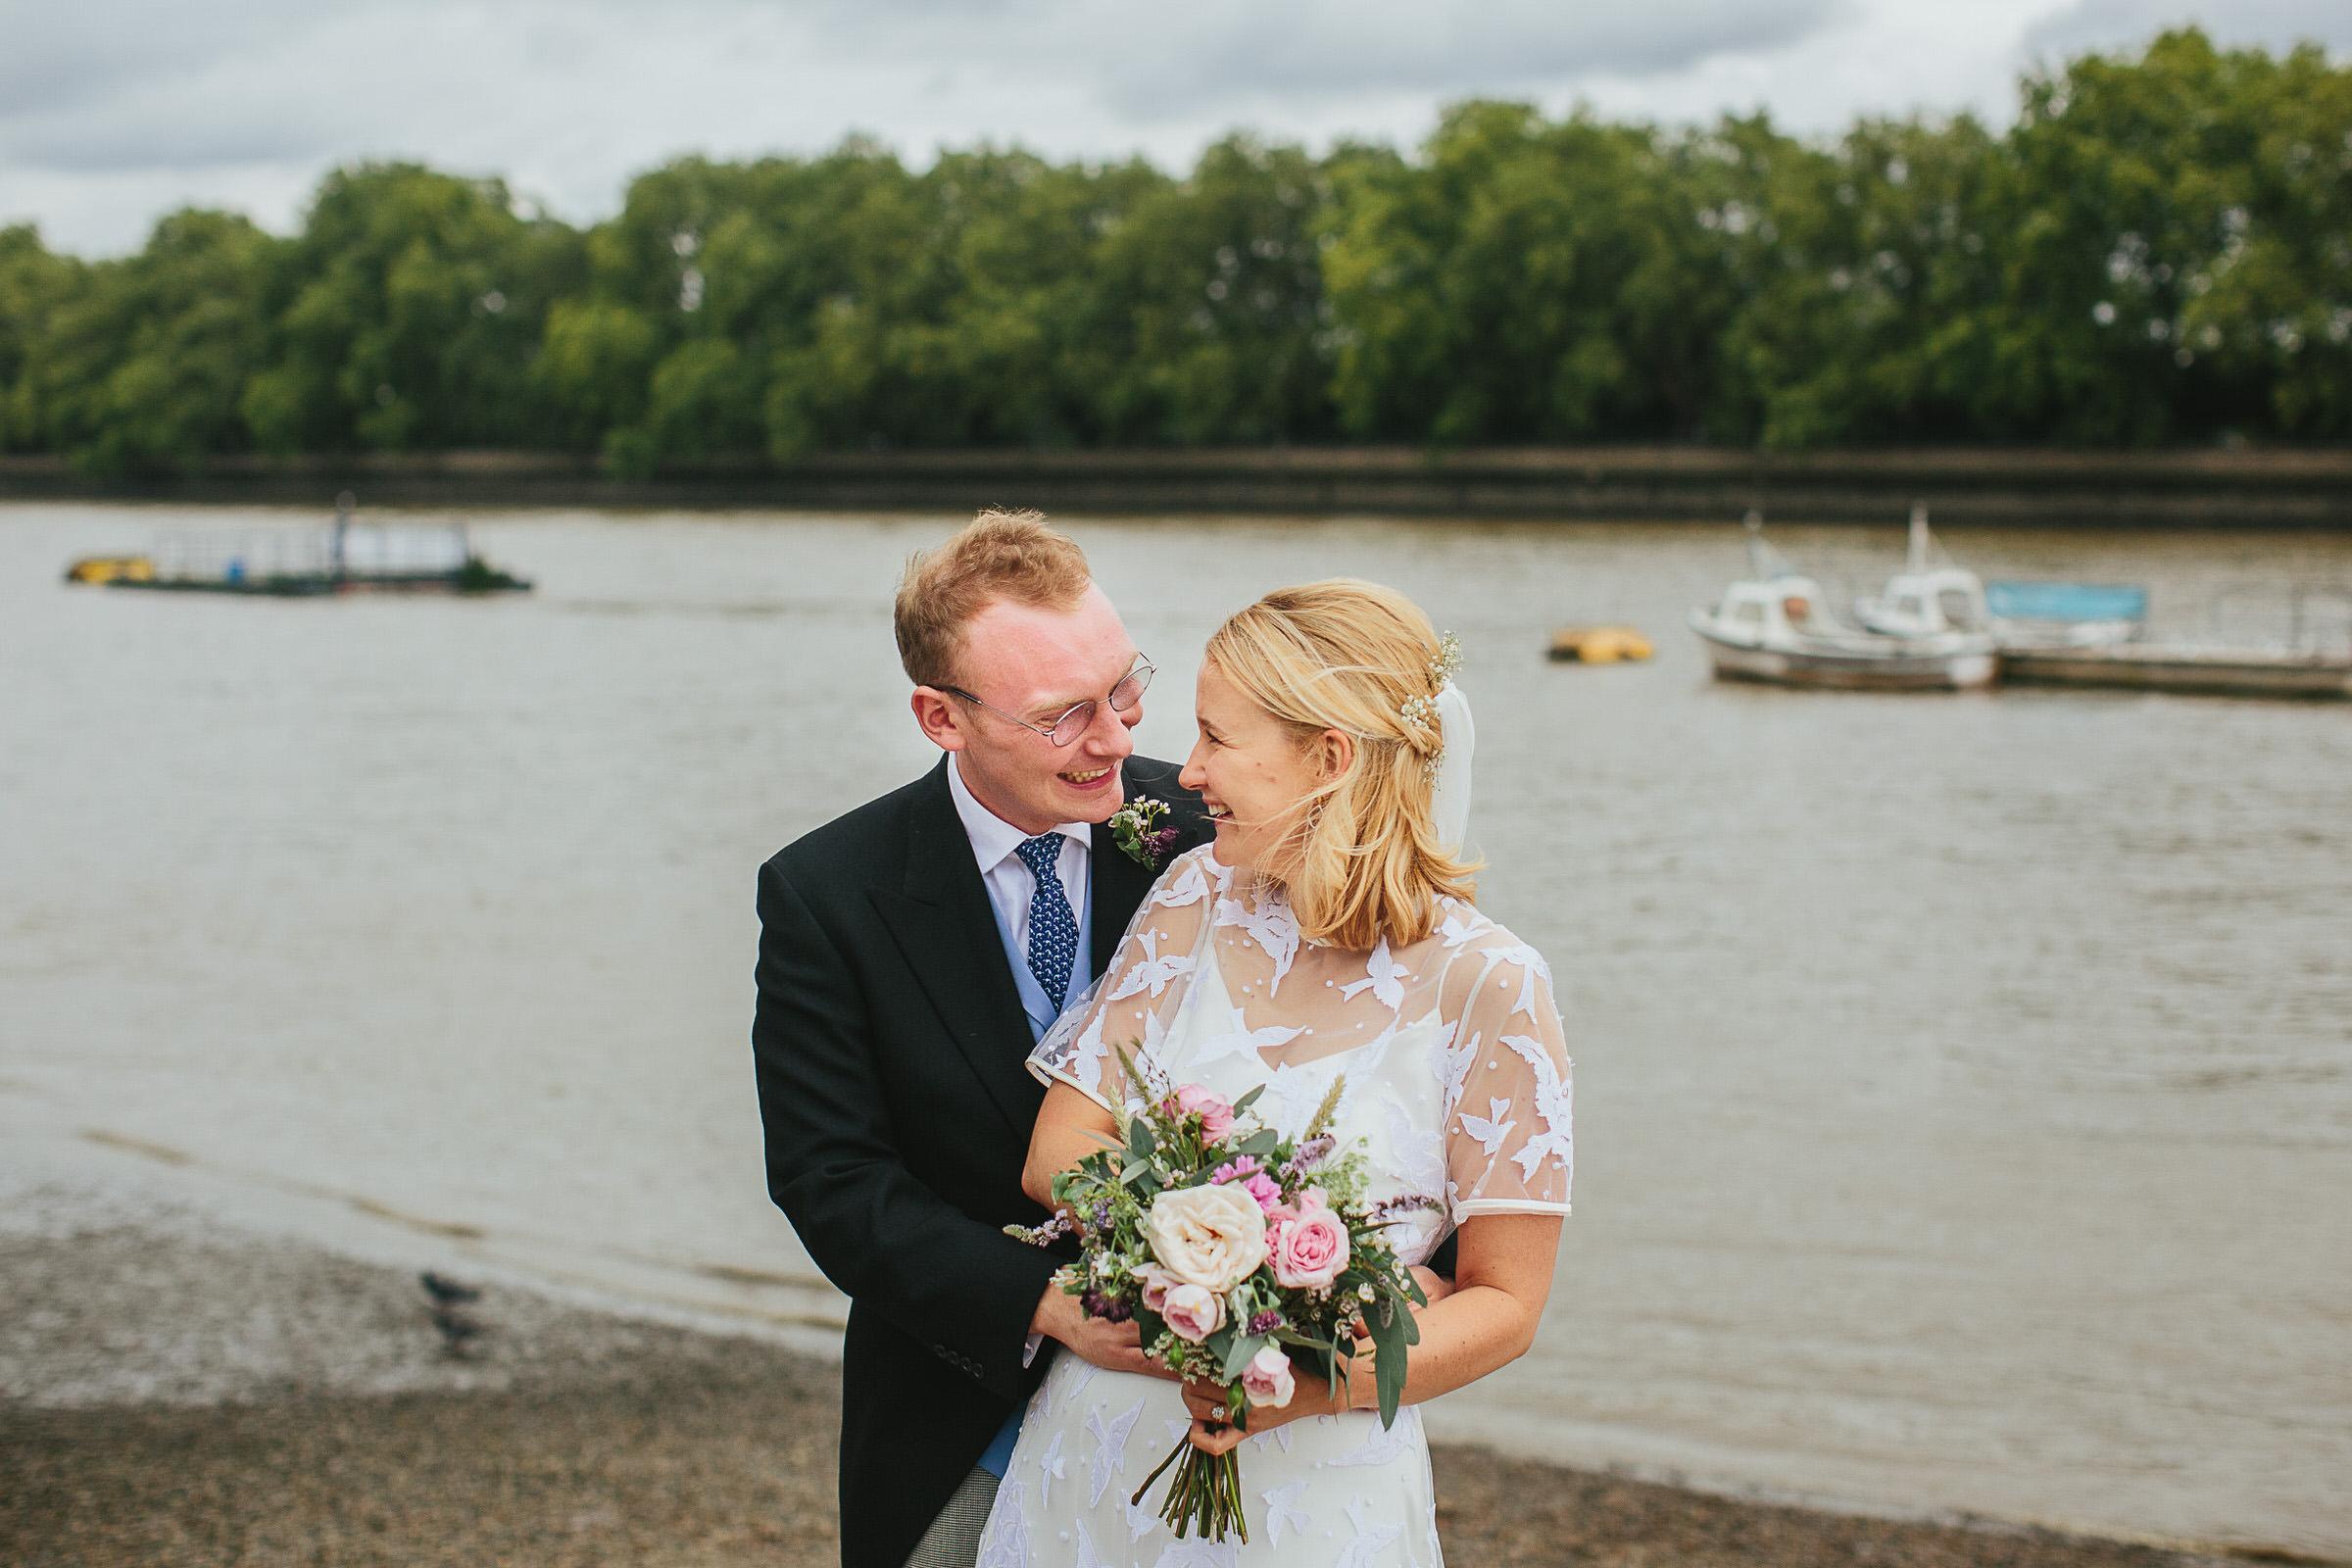 Thames Rowing Club - Harriet & James